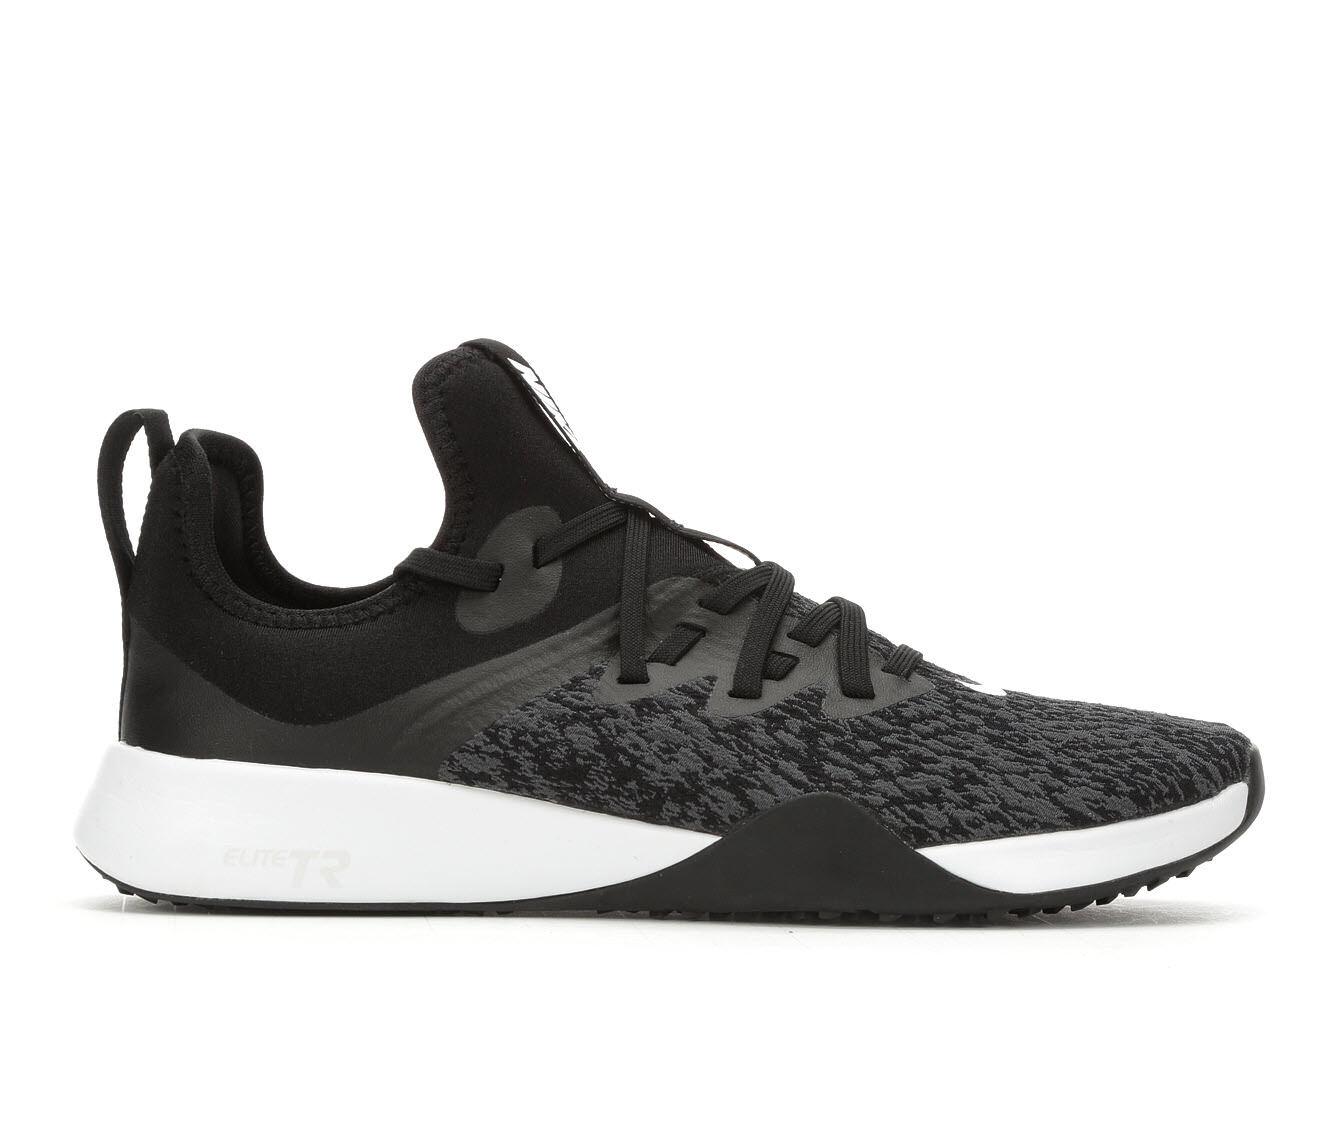 Women's Nike Foundation Elite TR Training Shoes Black/Wht/Anth